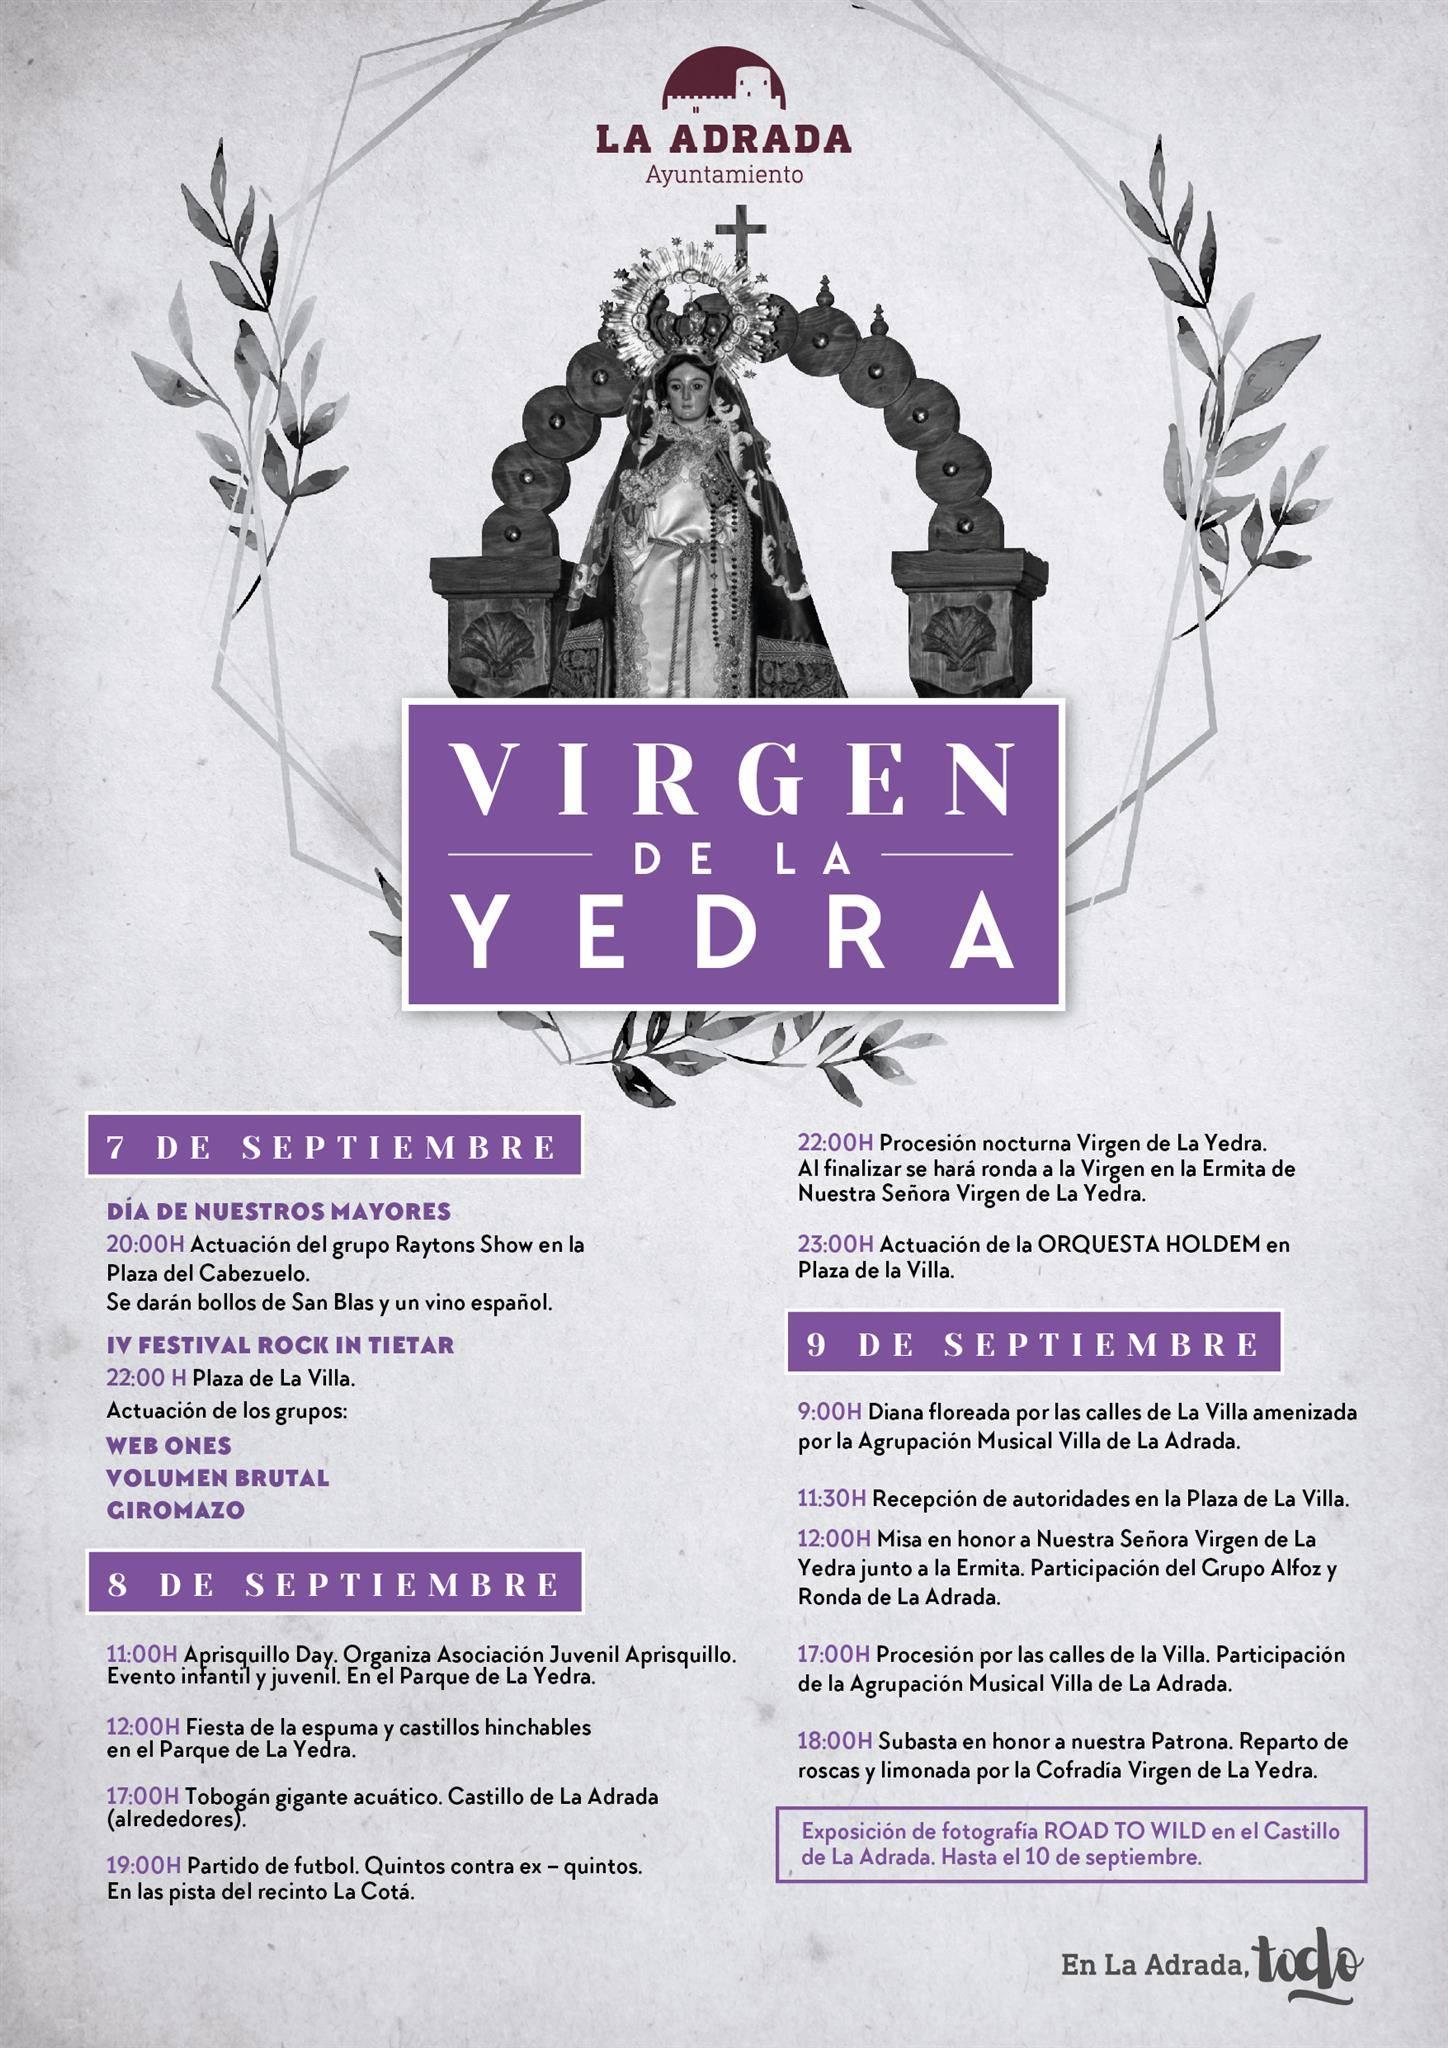 Virgen de La Yedra - La Adrada - TiétarTeVe